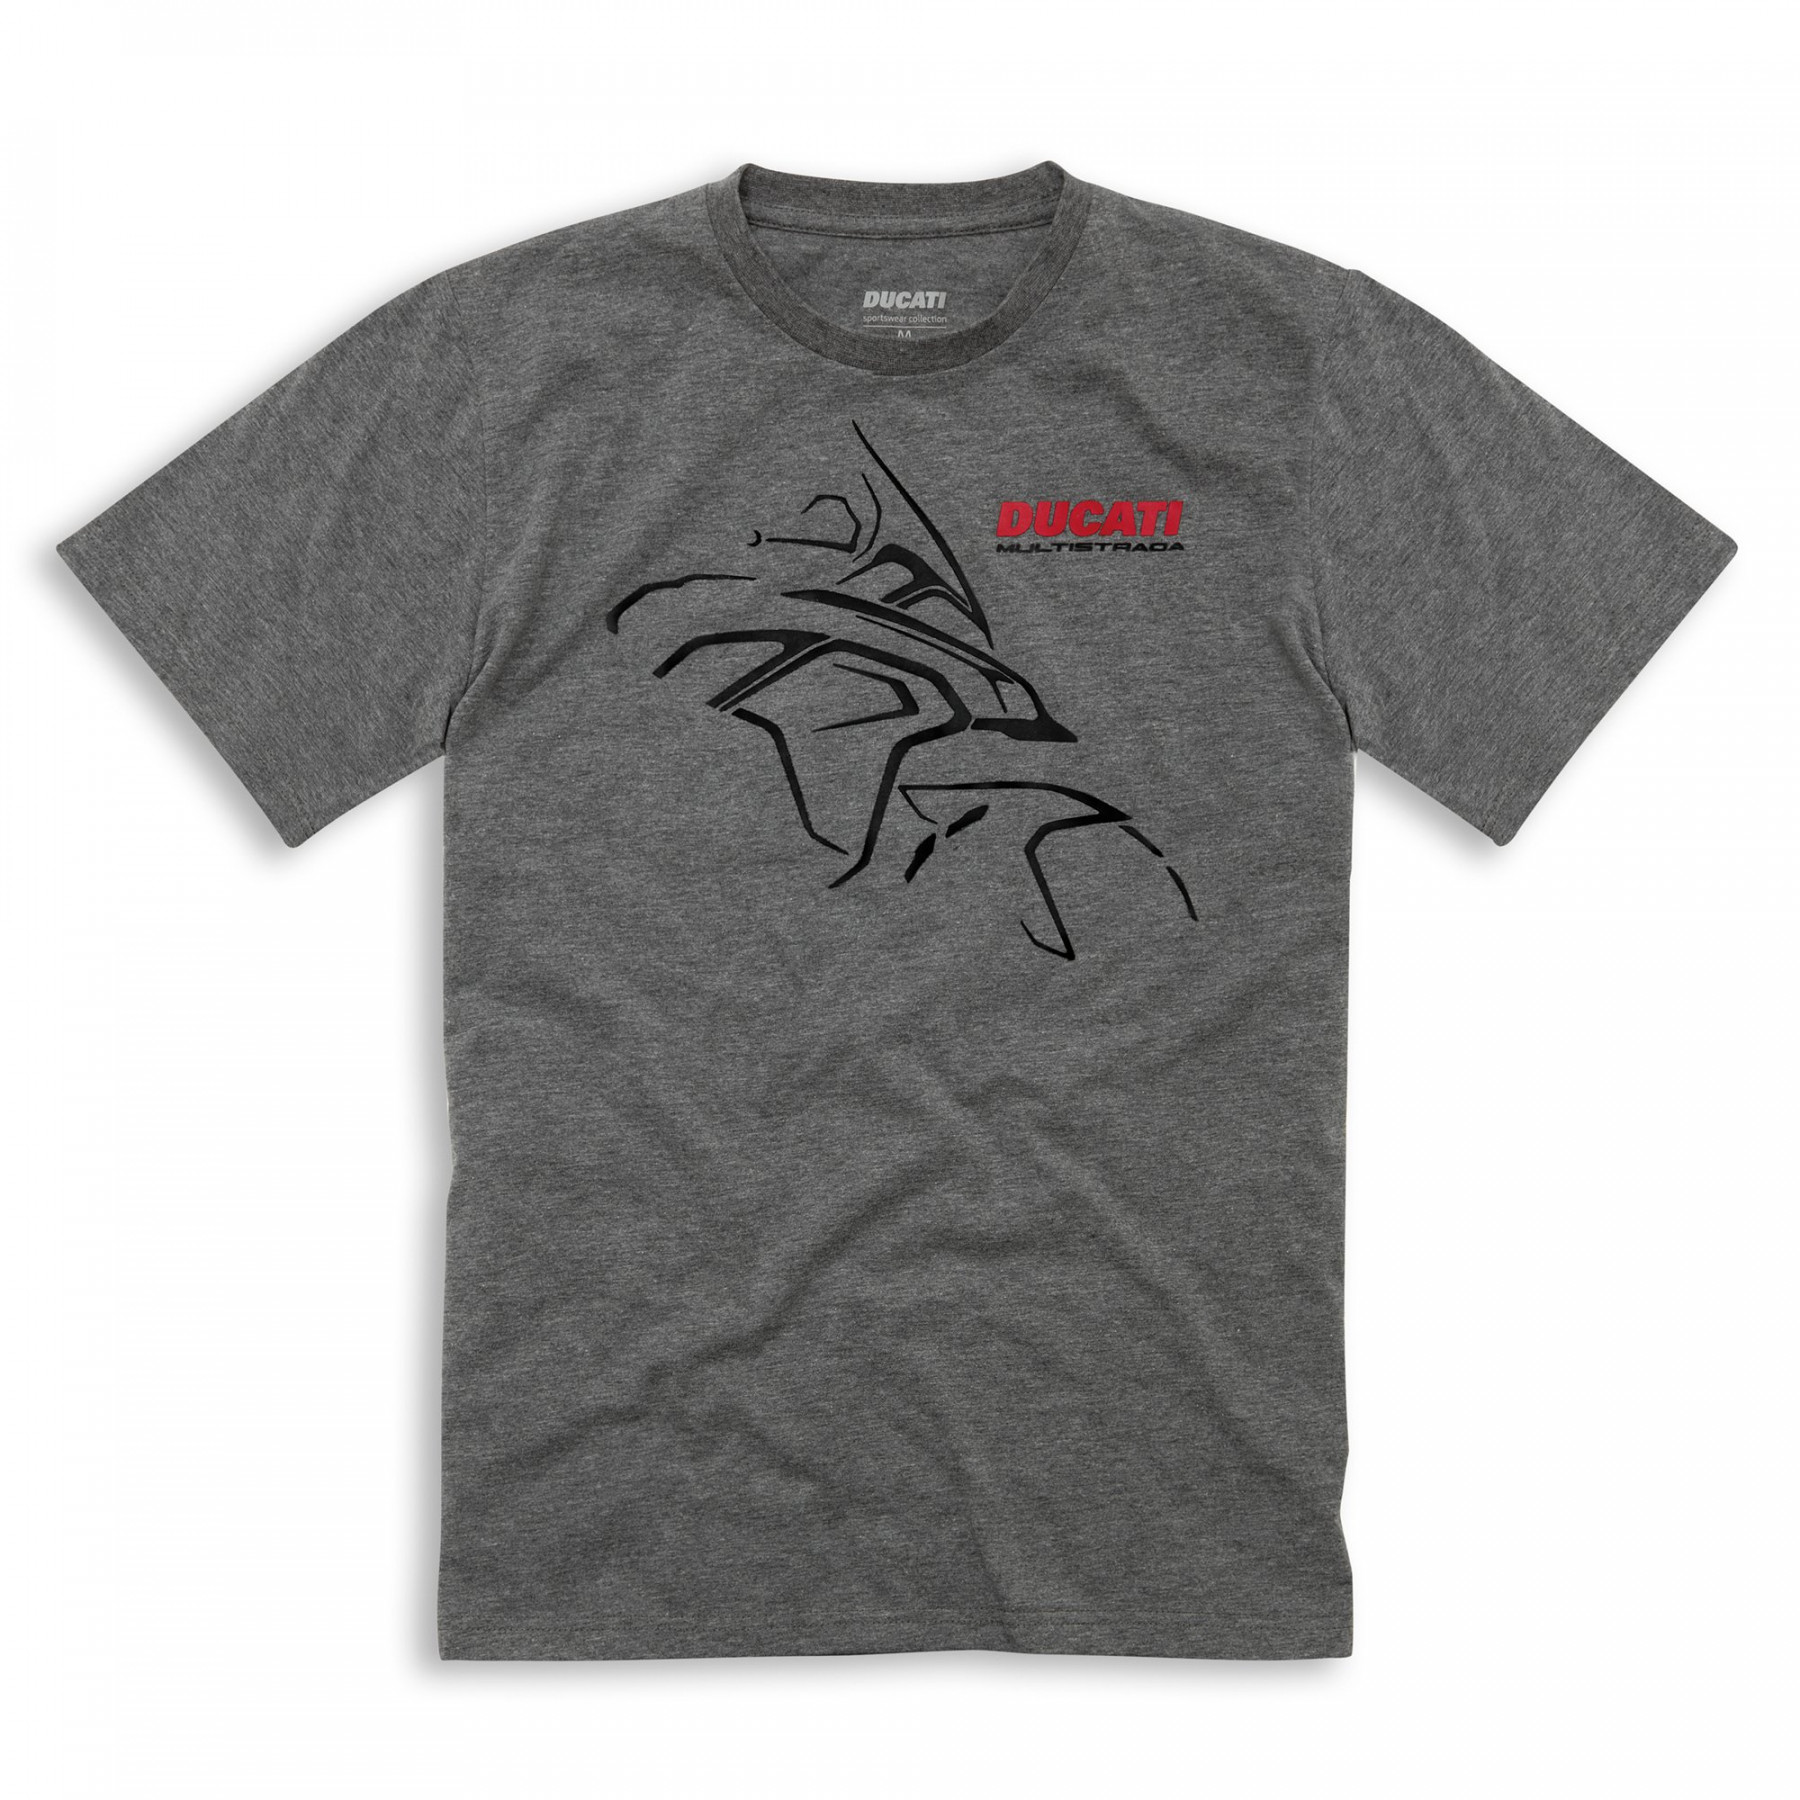 T-shirt Ducati Multistrada Journey